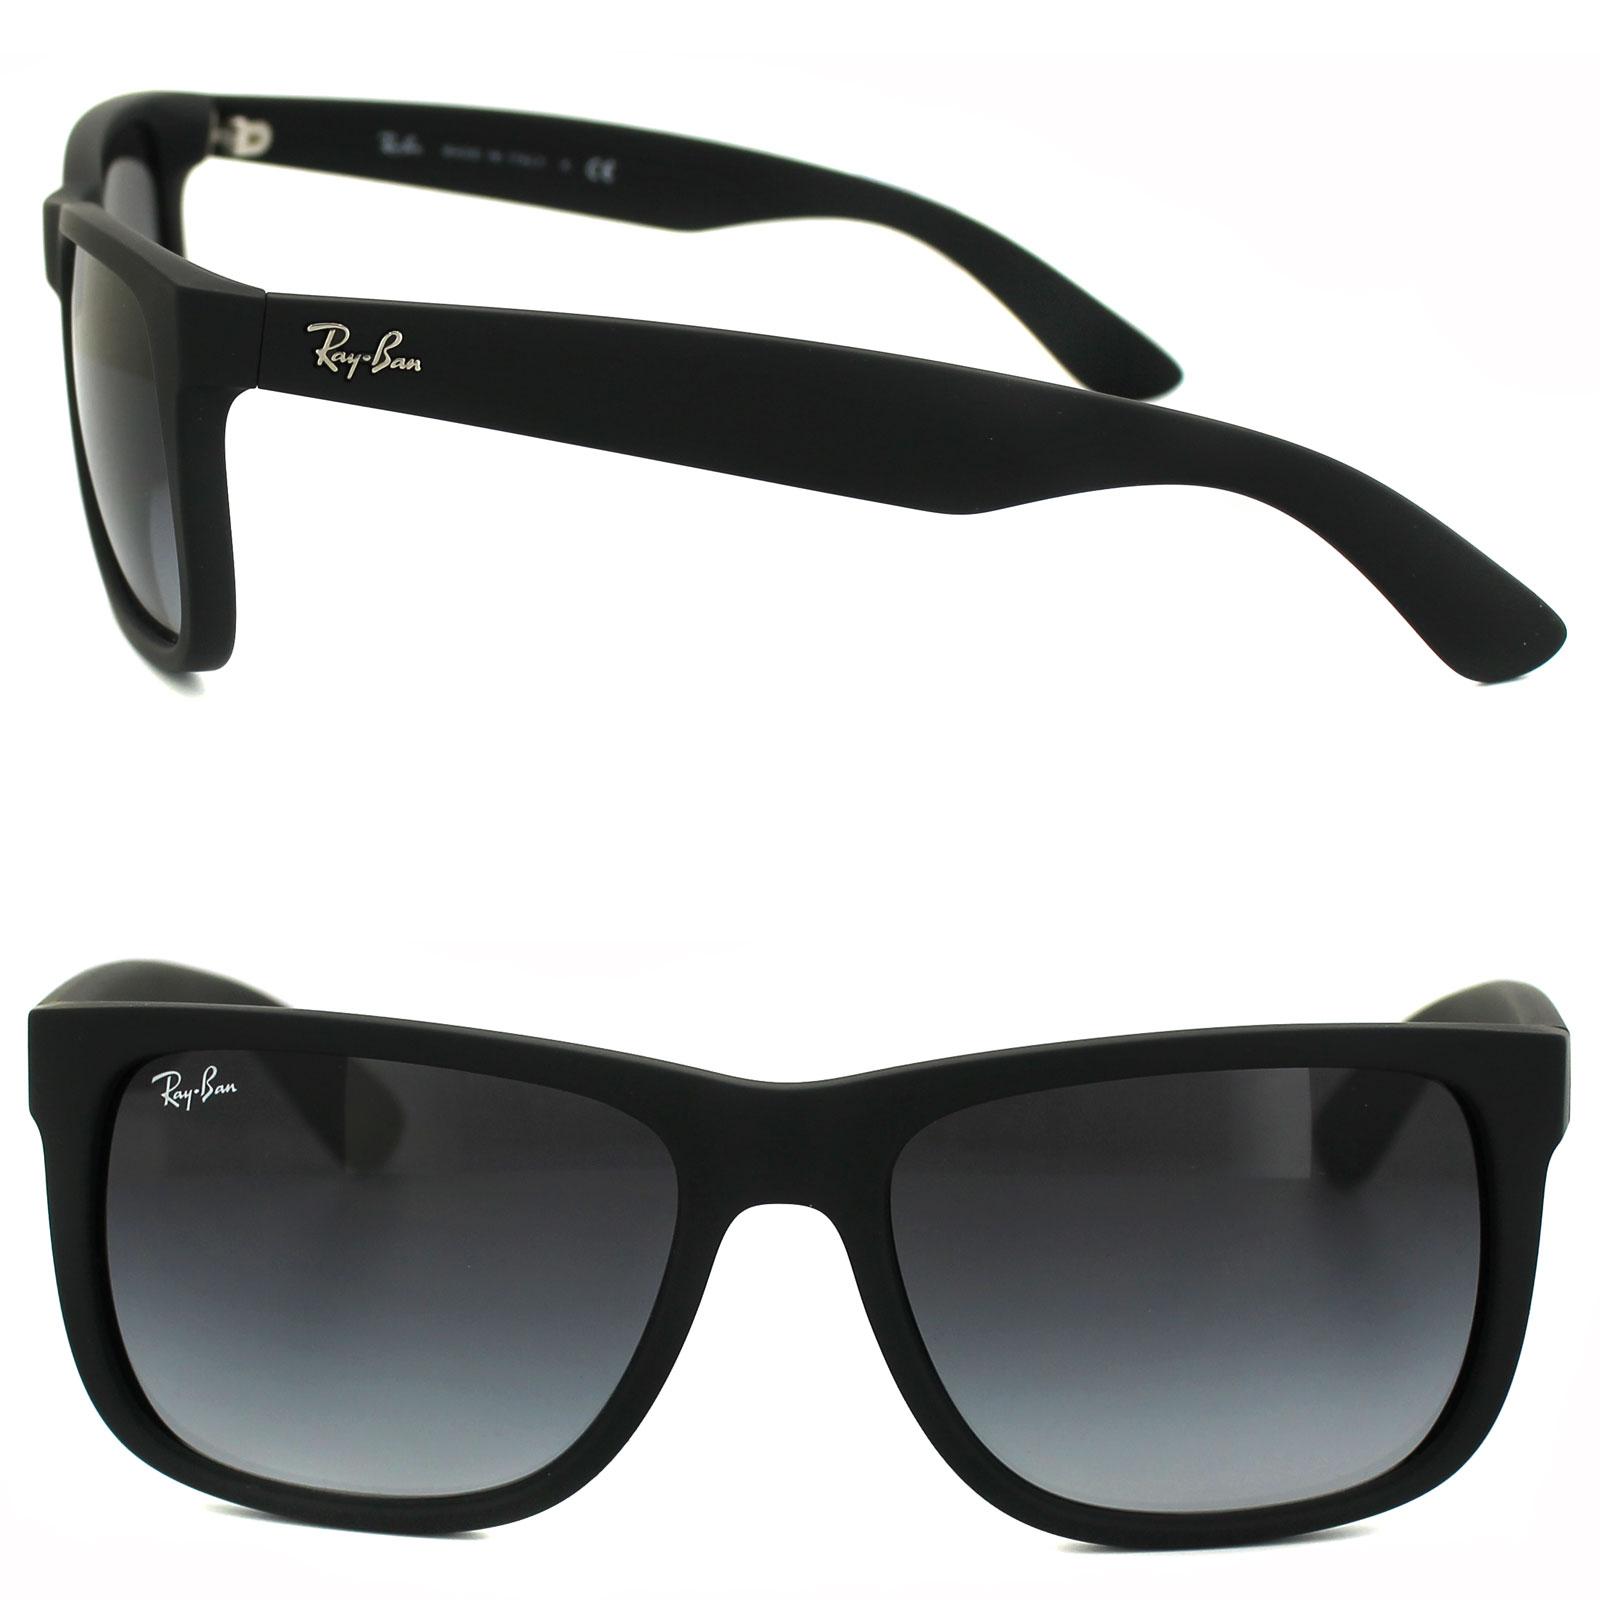 7dbafc1039 Sentinel Ray-Ban Sunglasses Justin 4165 601 8G Rubber Black Grey Gradient  Small 51mm